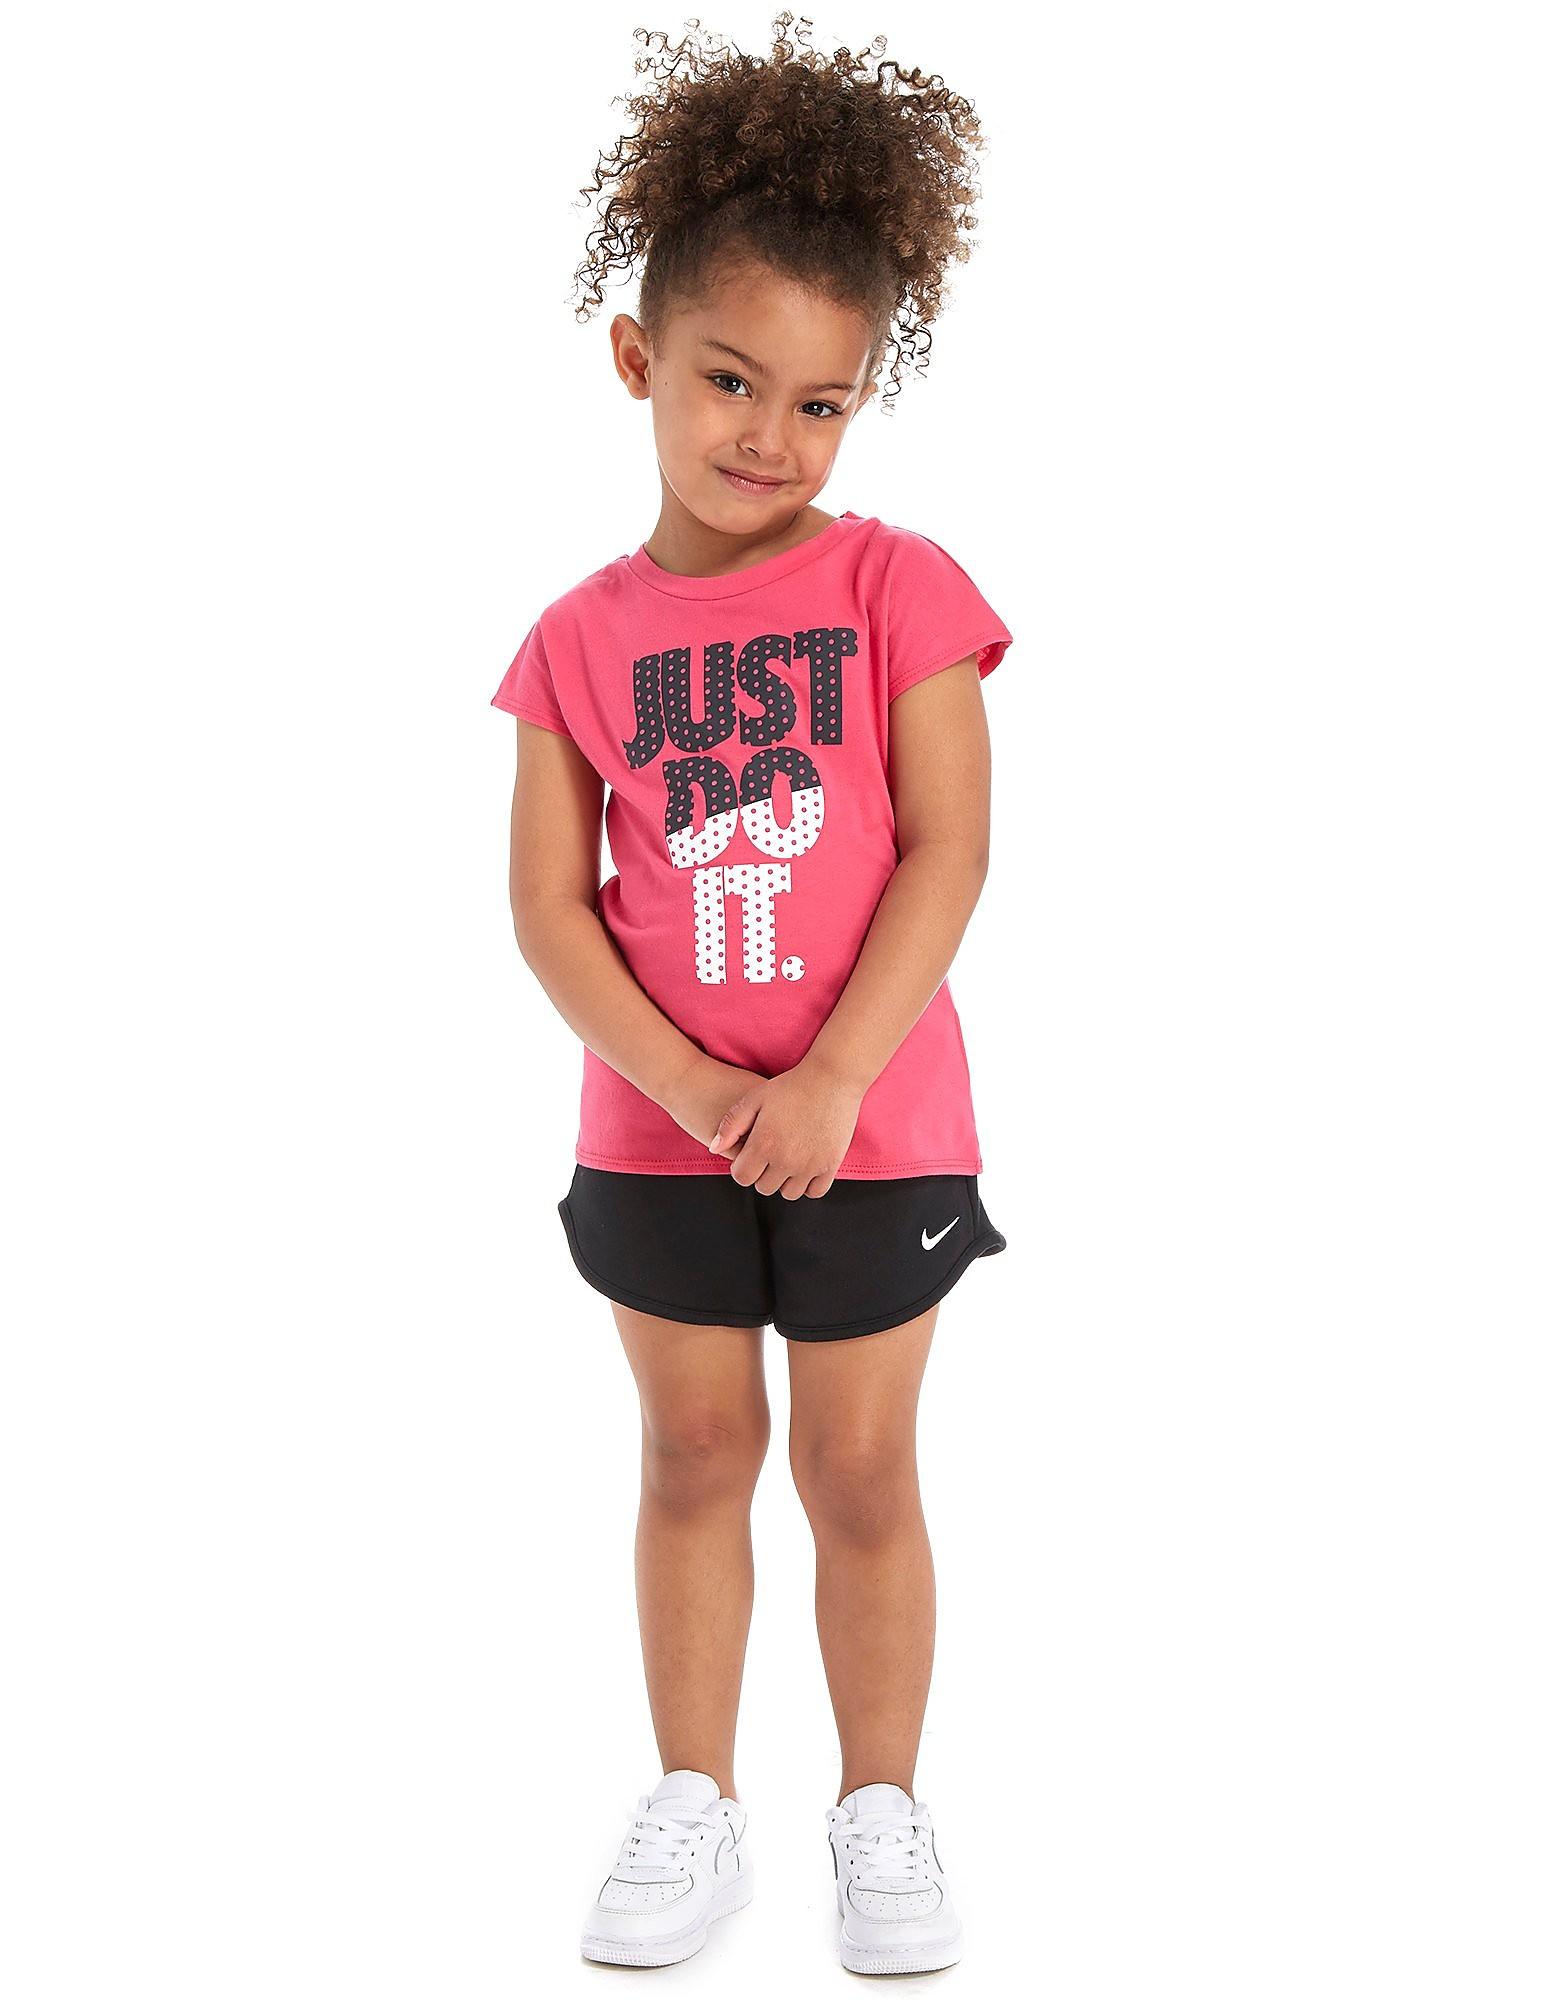 Nike Girls' T-Shirt + Short Set Children